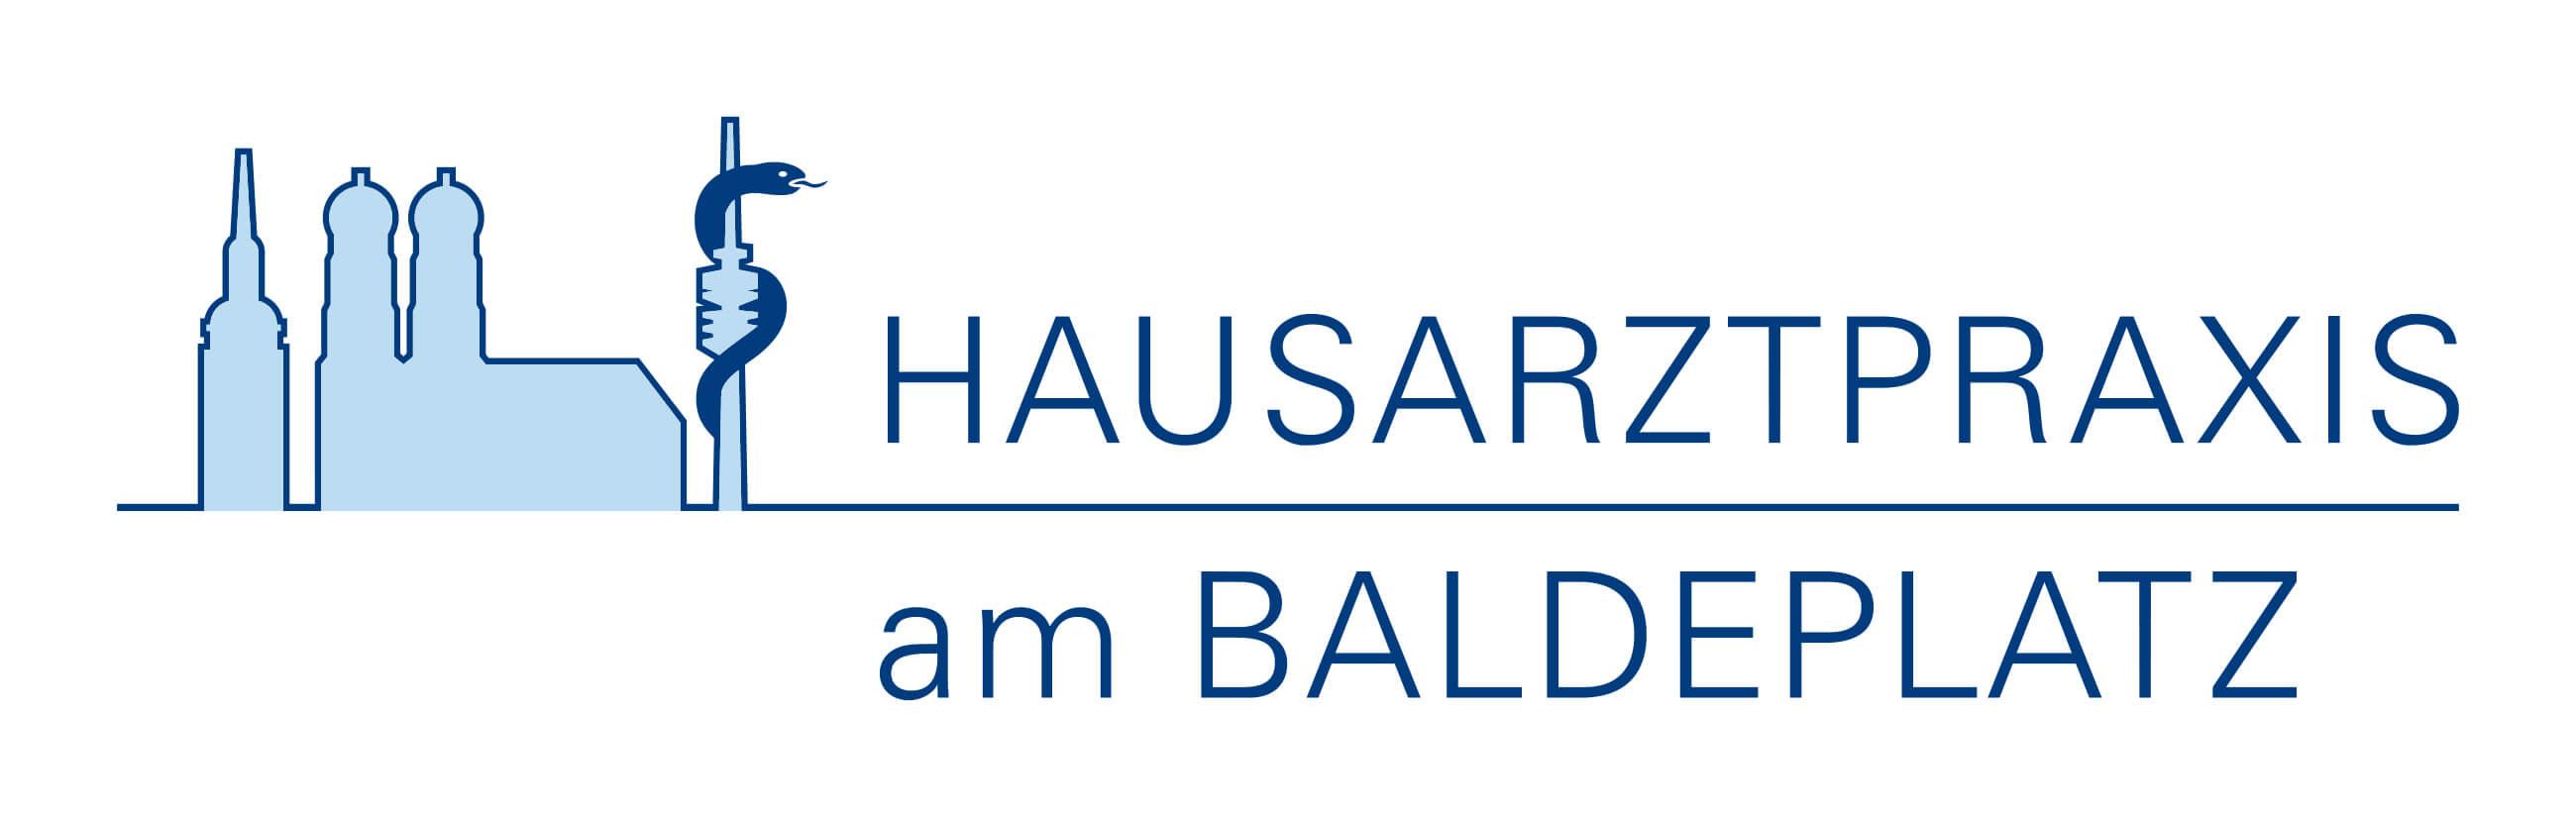 HAUSARZTPRAXIS AM BALDEPLATZ